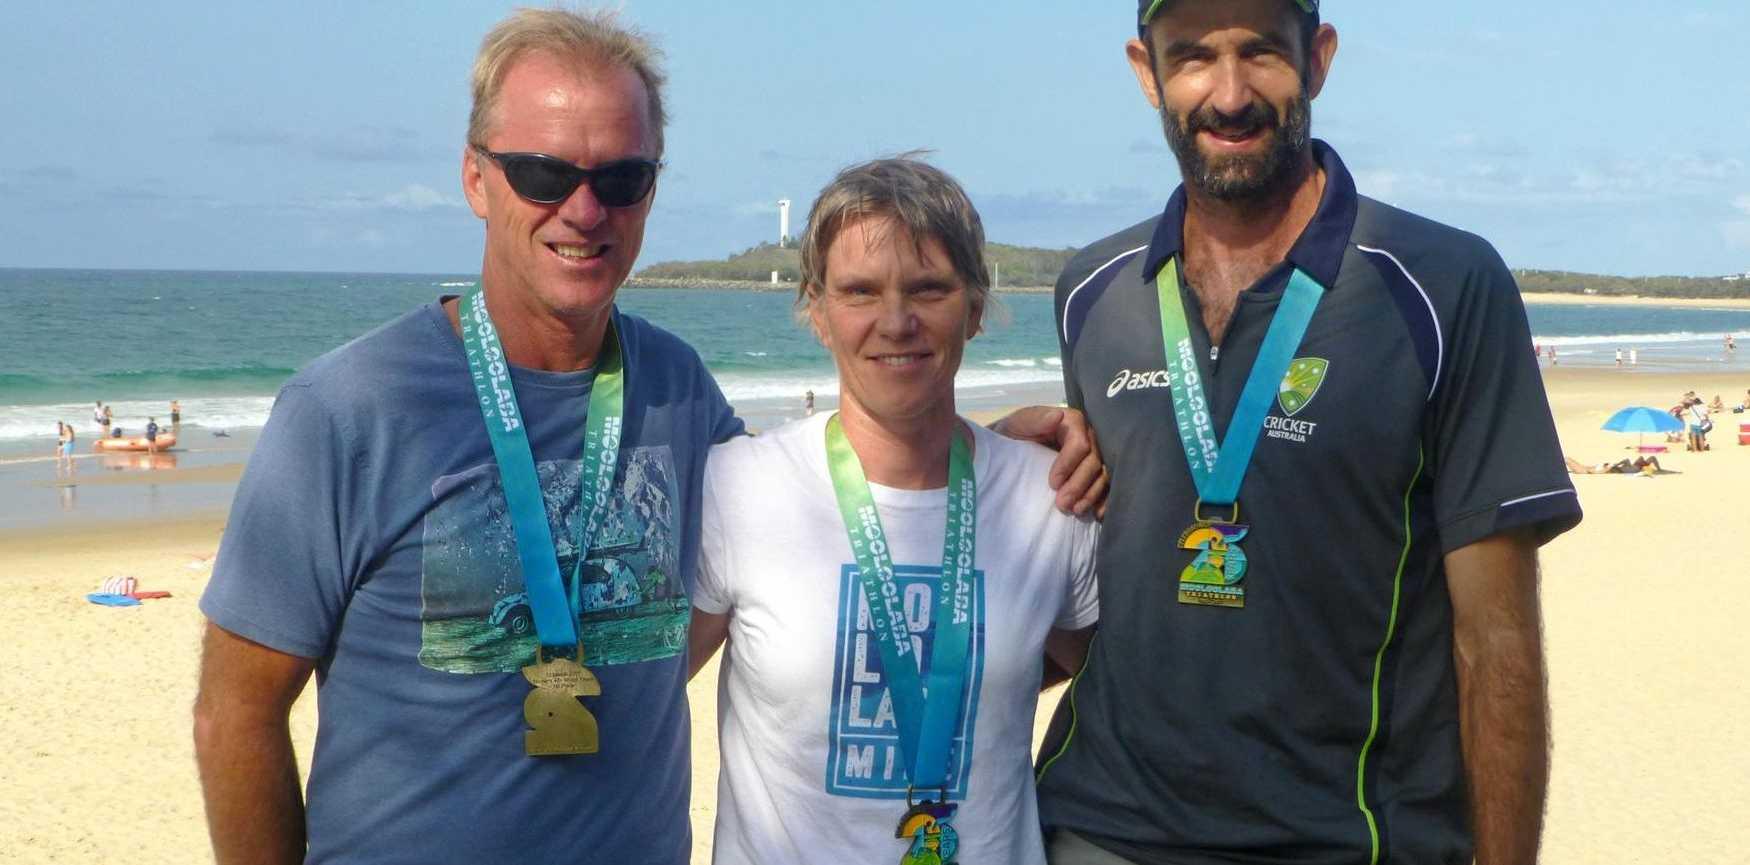 The successful Big Hit triathlon team (from left) Robert Partington, Shiralee Bielenberg and Paul Shard at the 2017 Mooloolaba Triathlon.